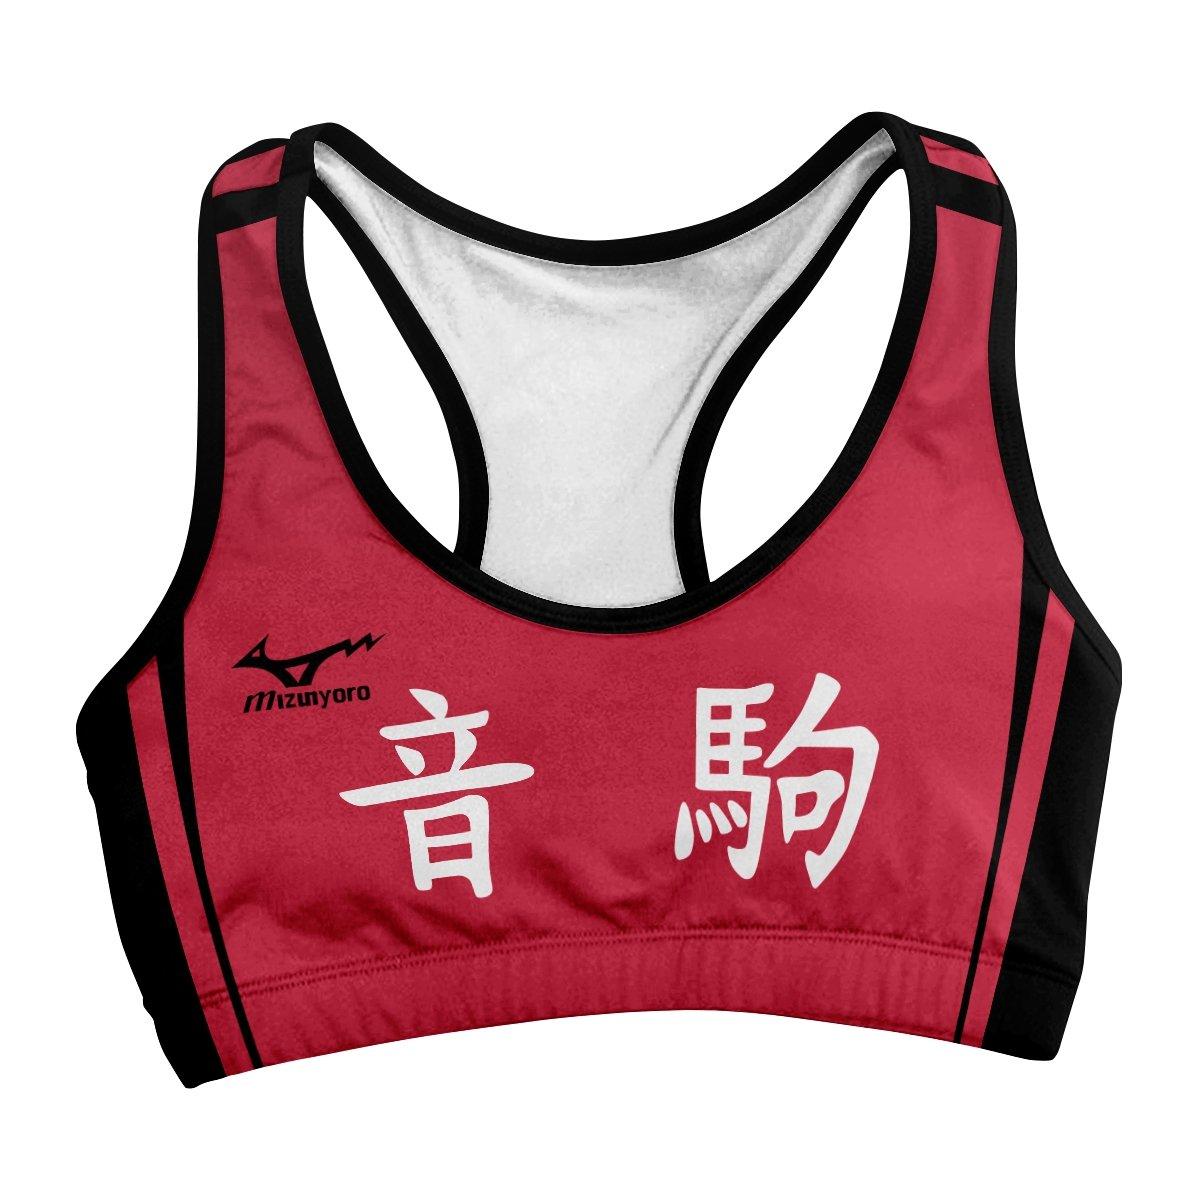 team nekoma active wear set 786263 - Anime Swimsuits